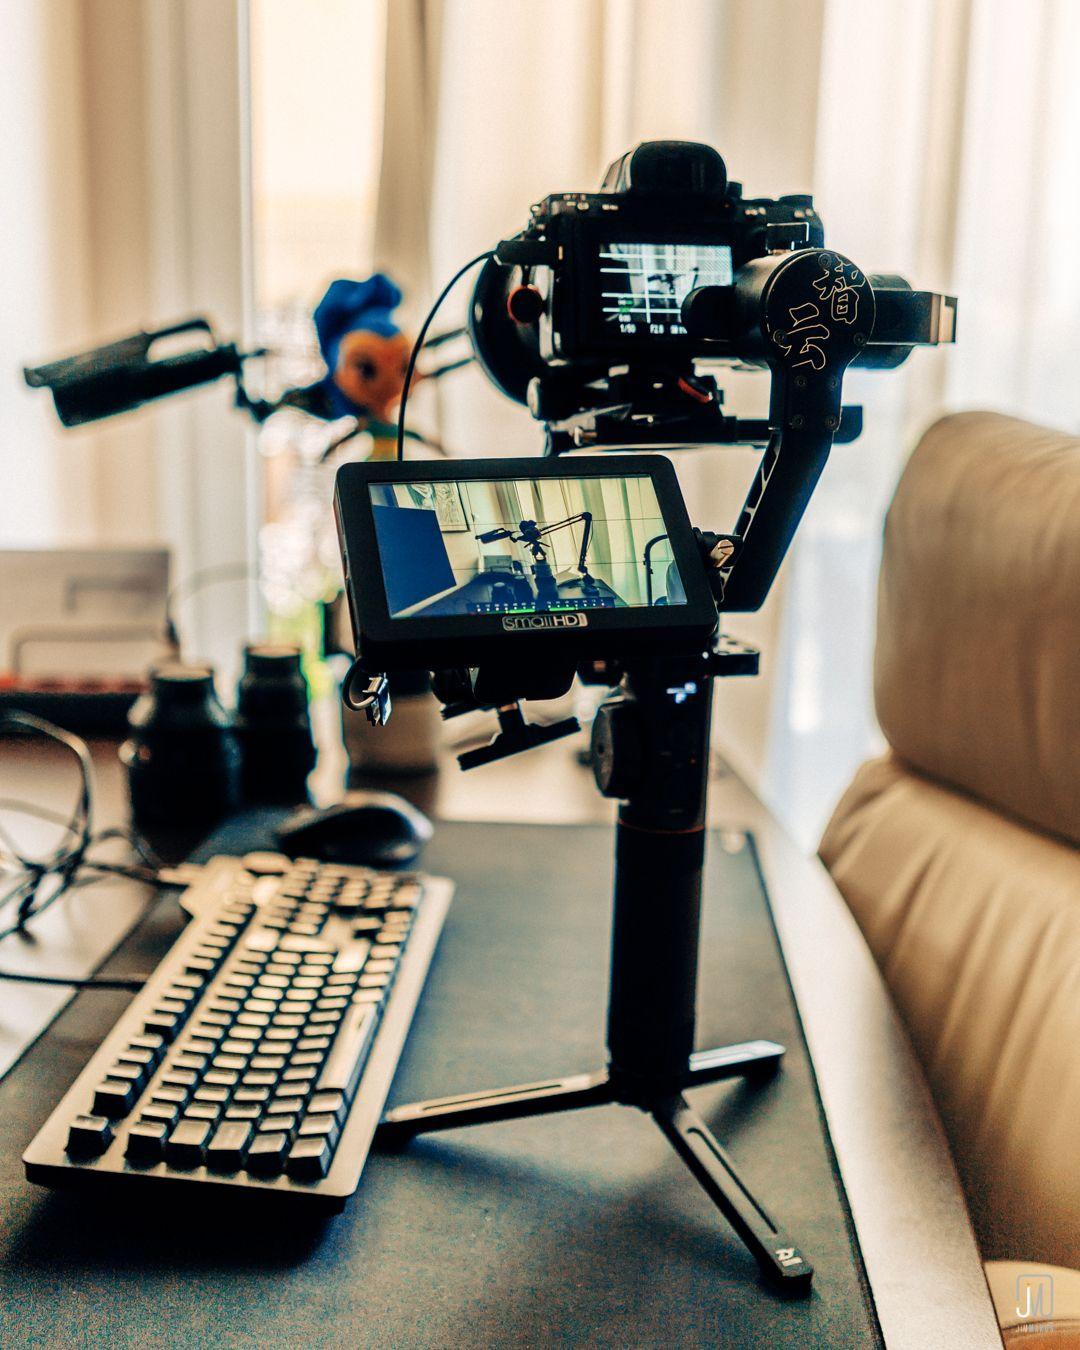 content-creation-camera-setup-office